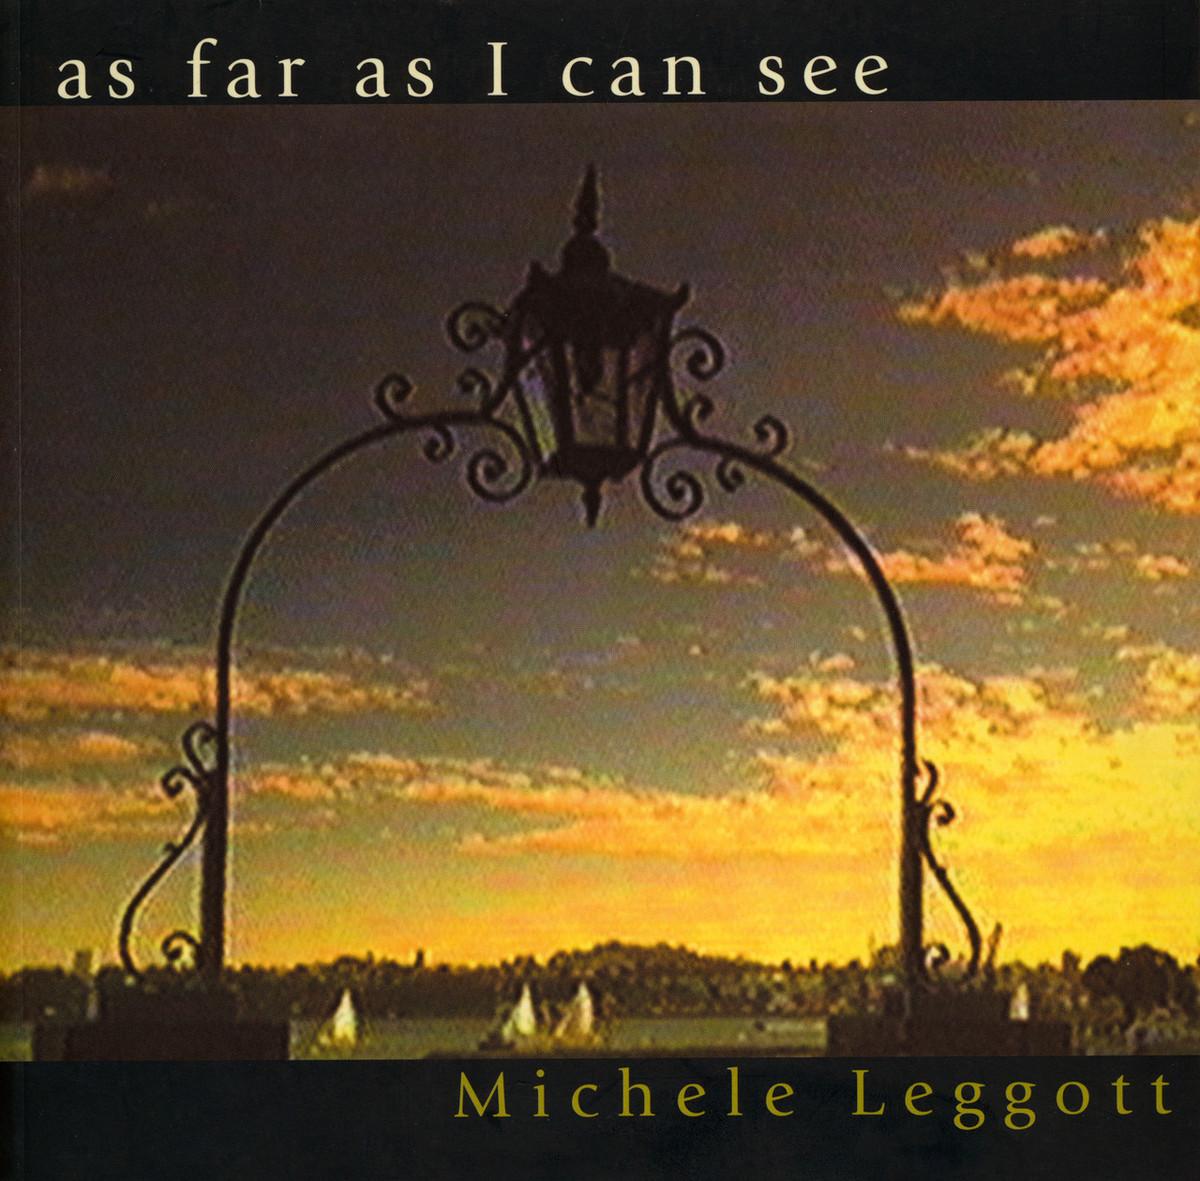 As Far as I Can See by Michele Leggott